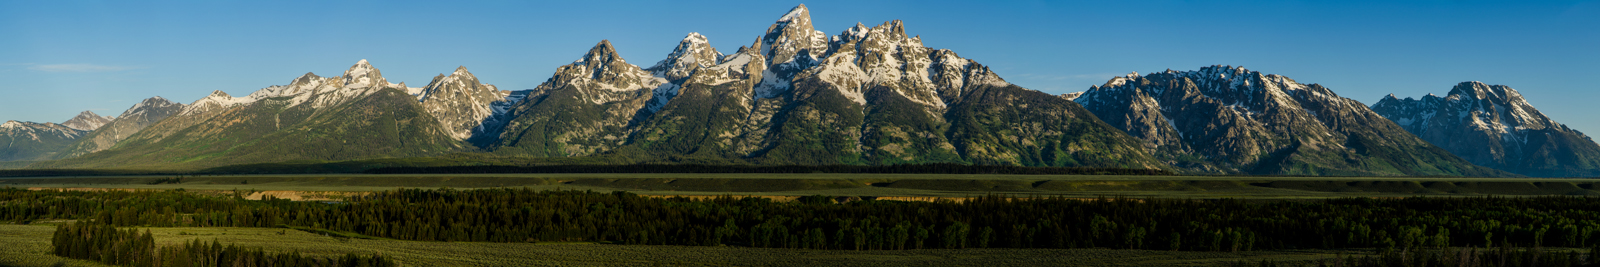 Grand Tetons Range